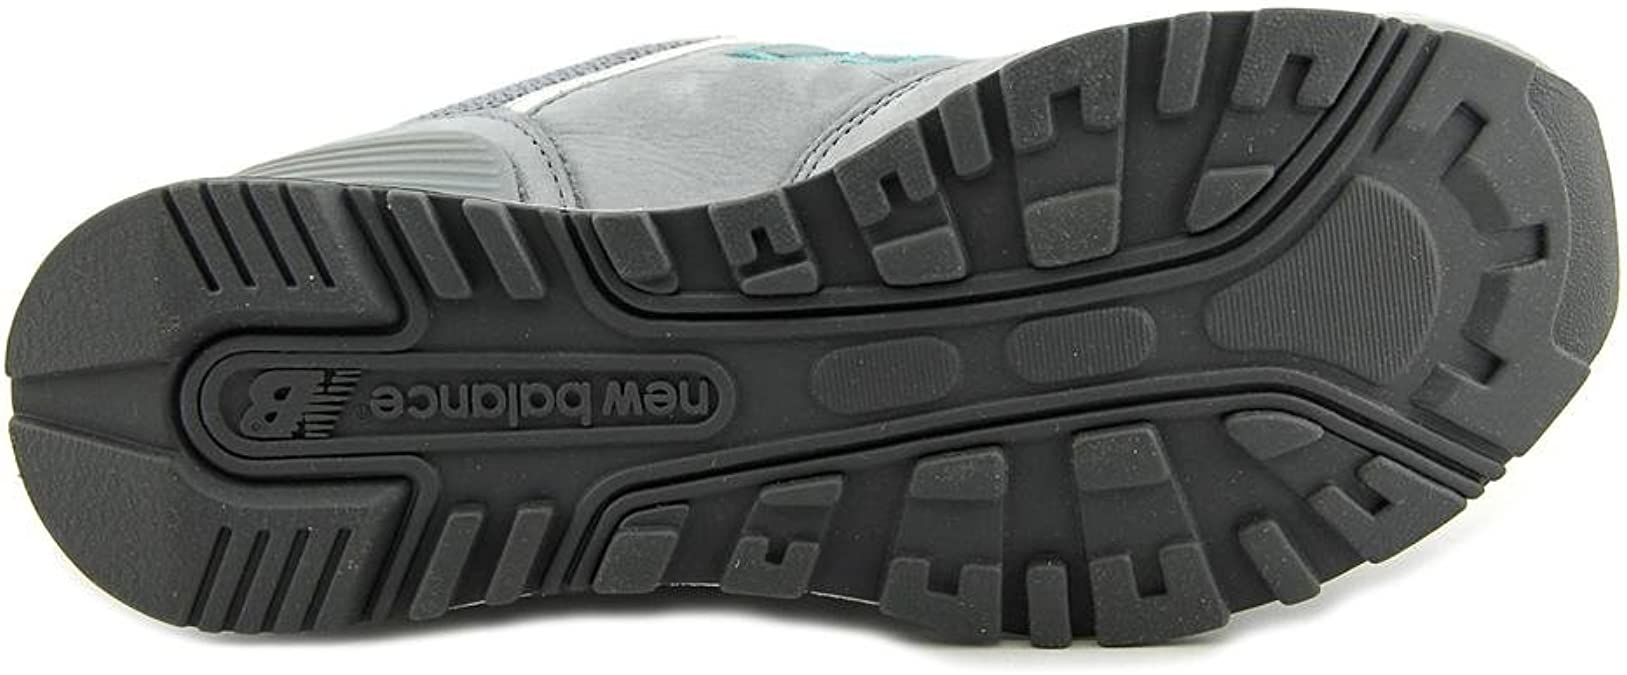 Amazon.com | New Balance Women's W576nbg | Fashion Sneakers